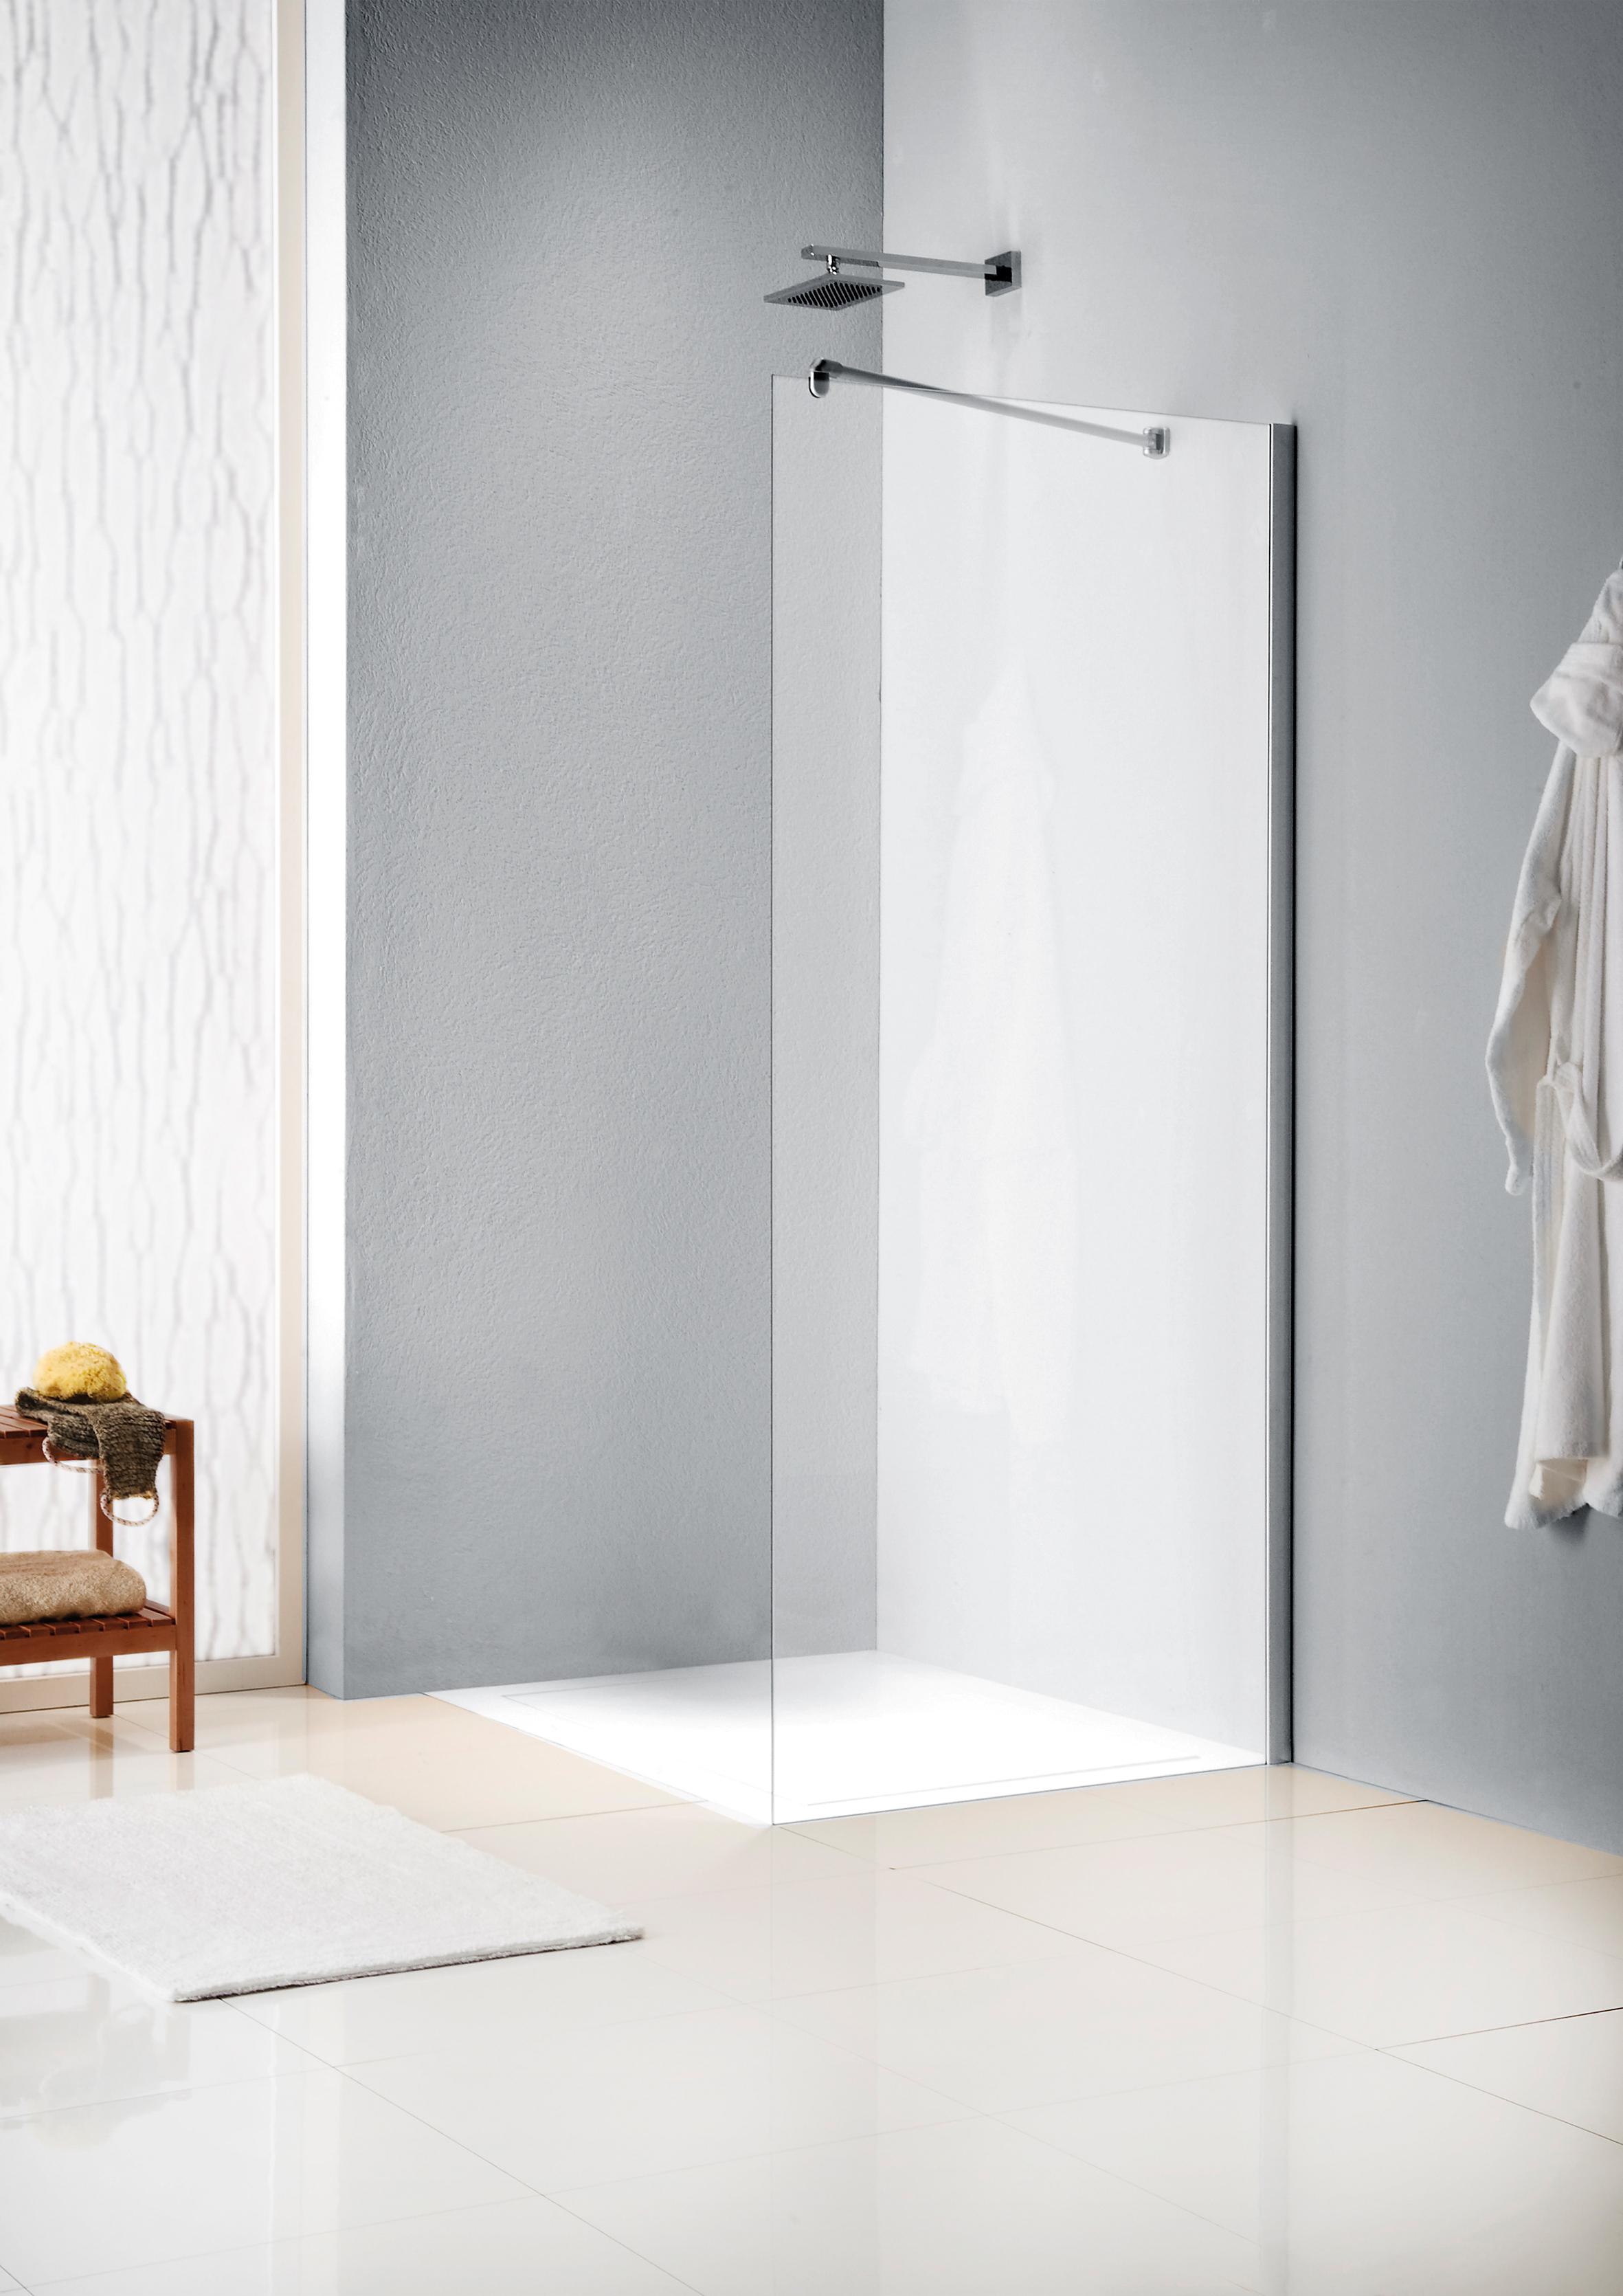 Sealskin Get Wet W205 inloopdouche 120x200cm mat zilver profiel en chinchilla glas